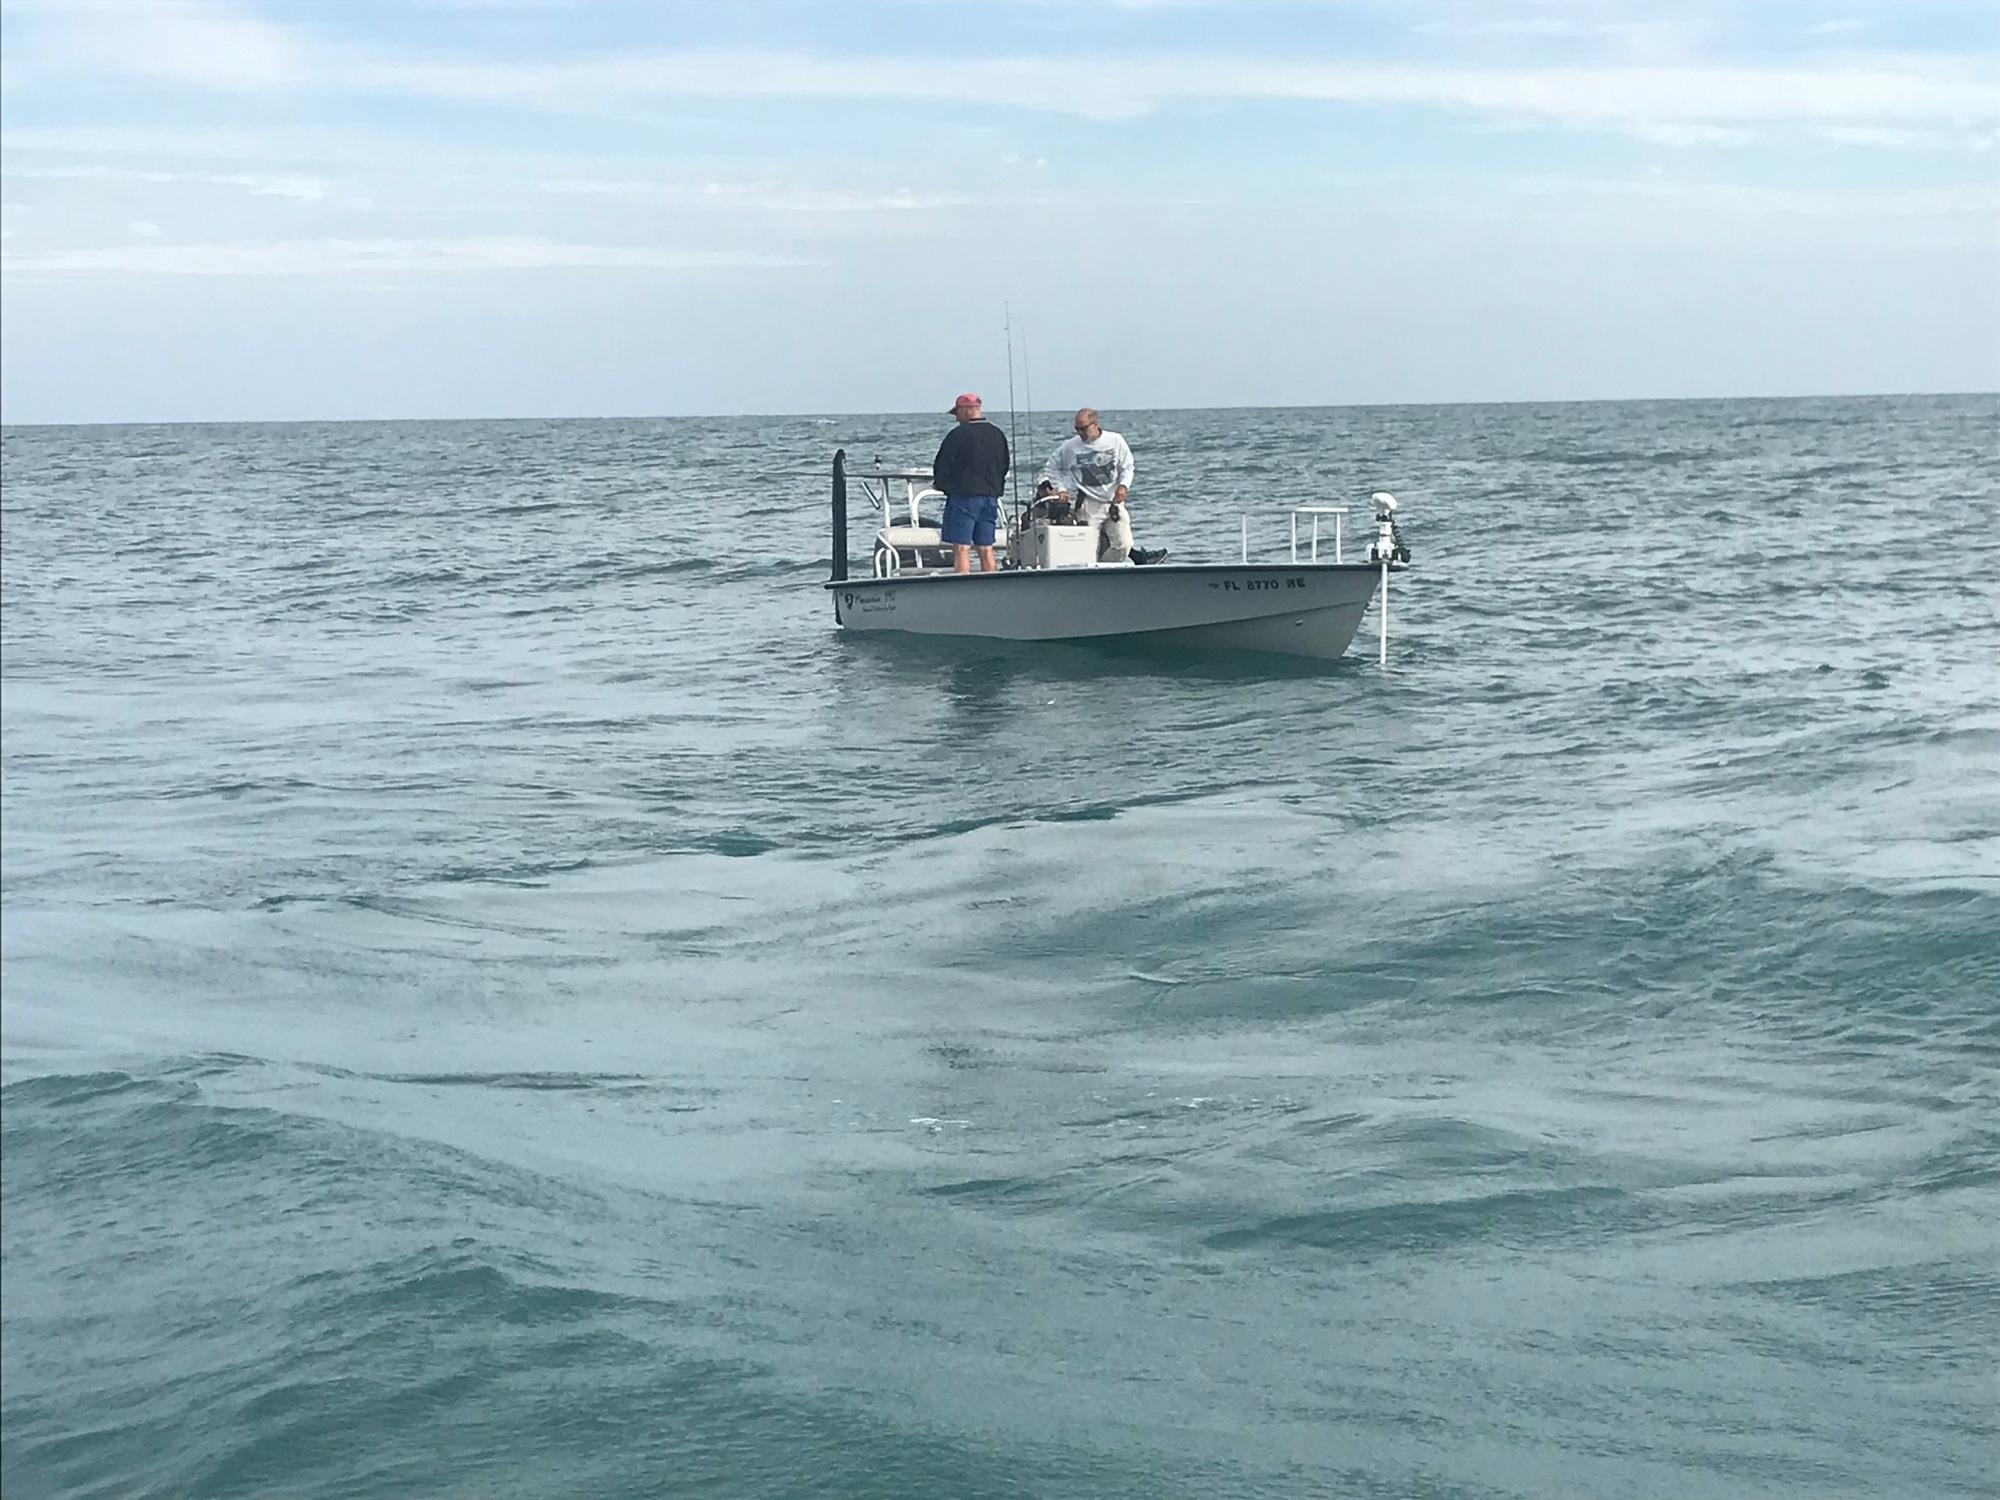 Coast Guard halts illegal charter operation near near Hutchinson Island